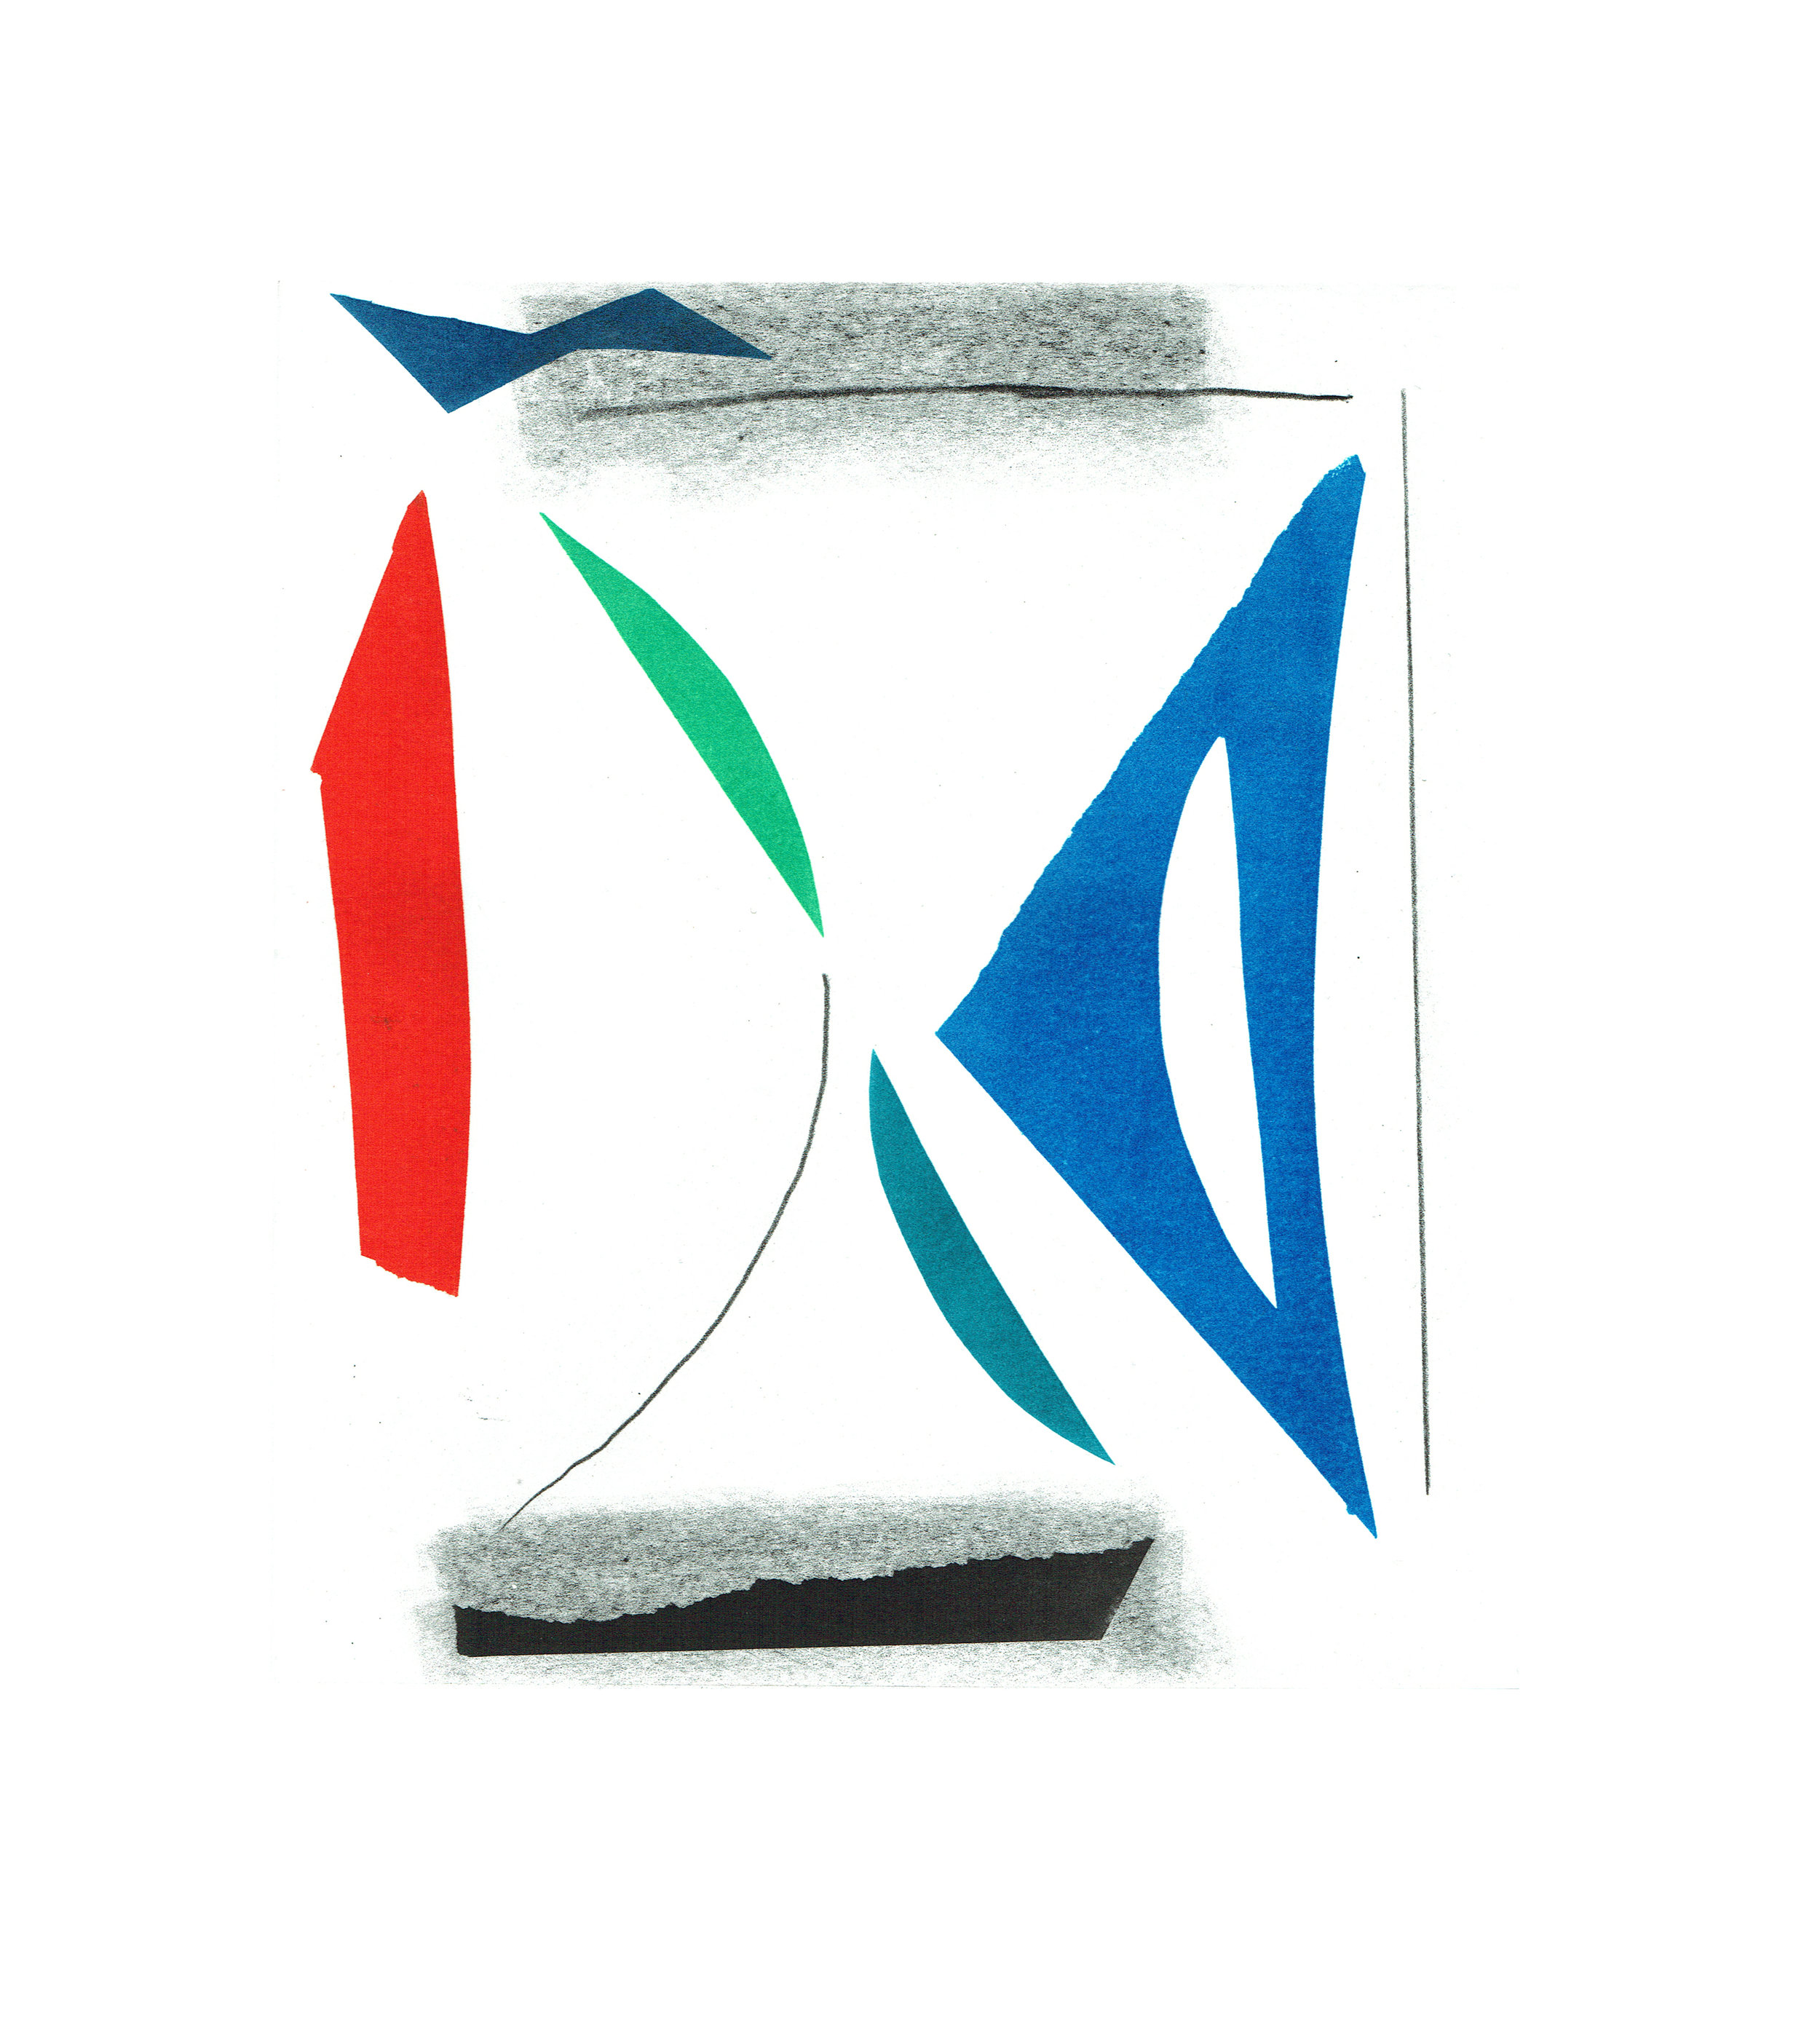 John McLean, Merry Go Round 7    Date: 2016  Size (cm - unframed):  38.2 x 34.4  Technique:  2 plate a la poupee etching  Materials:  Somerset Valvet 300gsm  Edition size:  20  Publisher: The Print Studio  Copyright: The Artist   POA